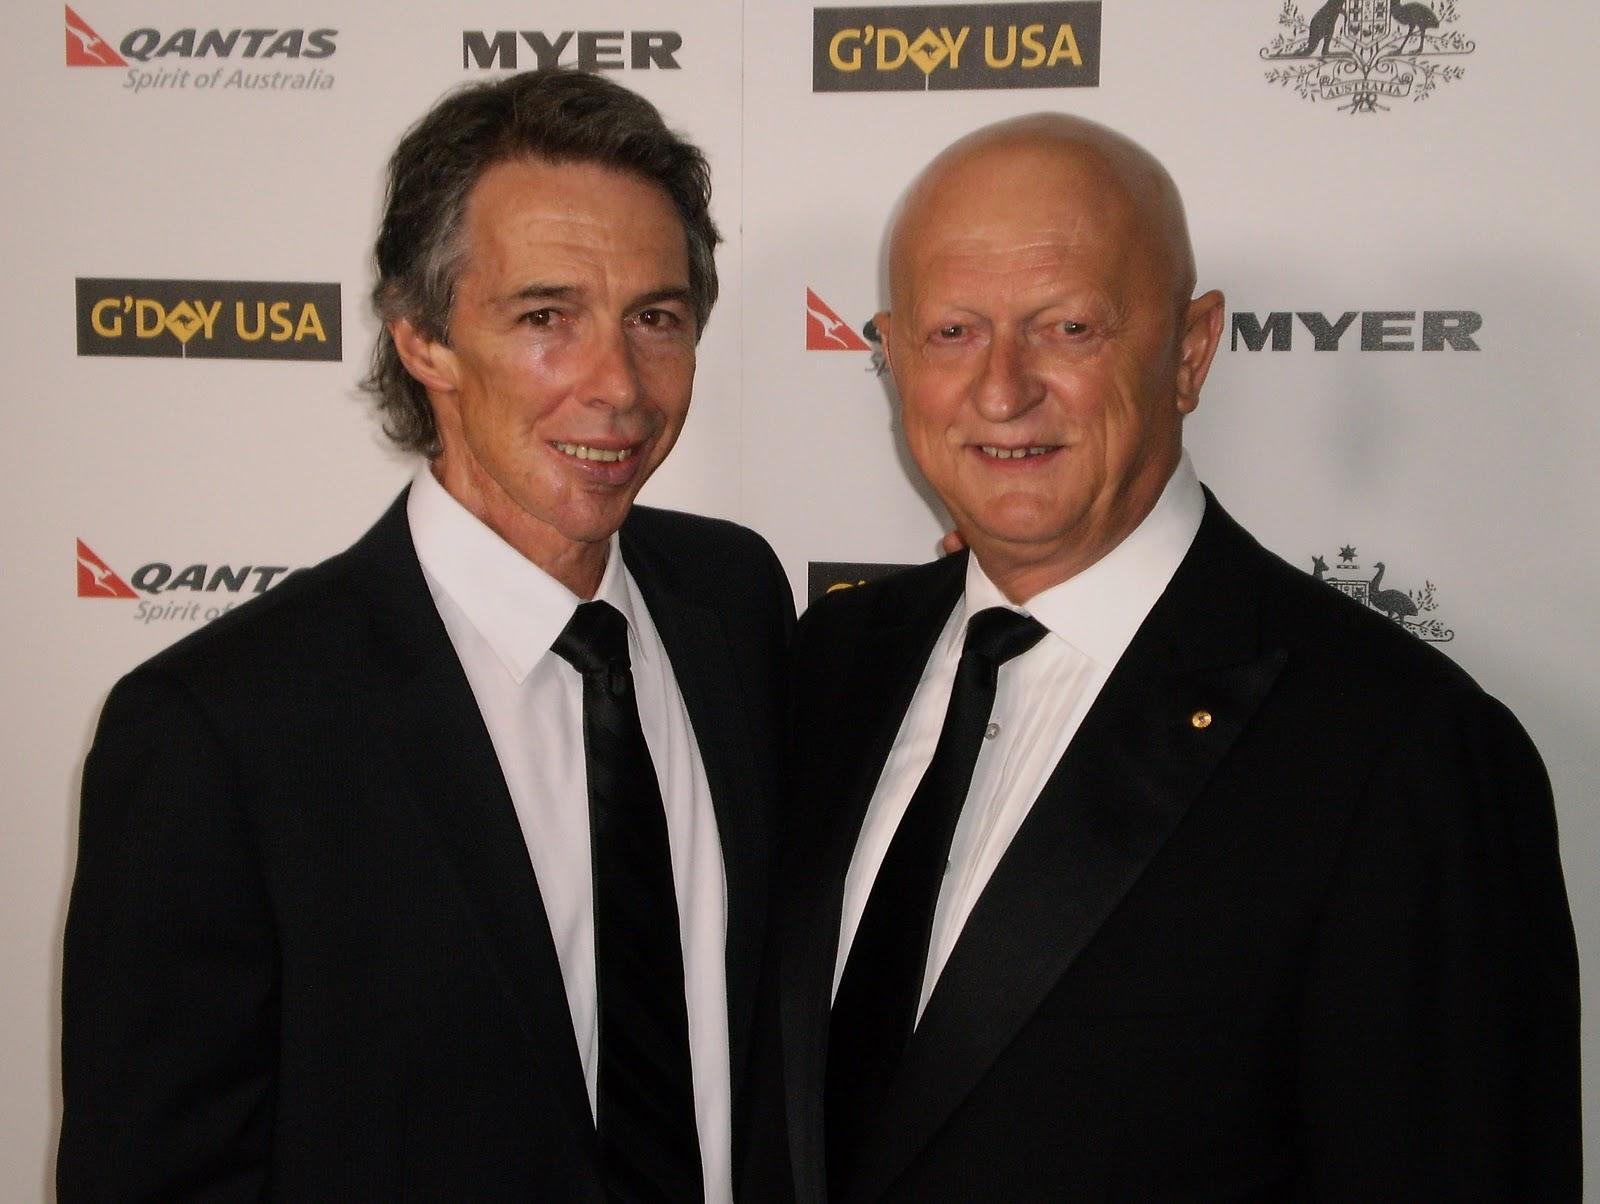 Simon Baker Scar Wally mariani, with actor